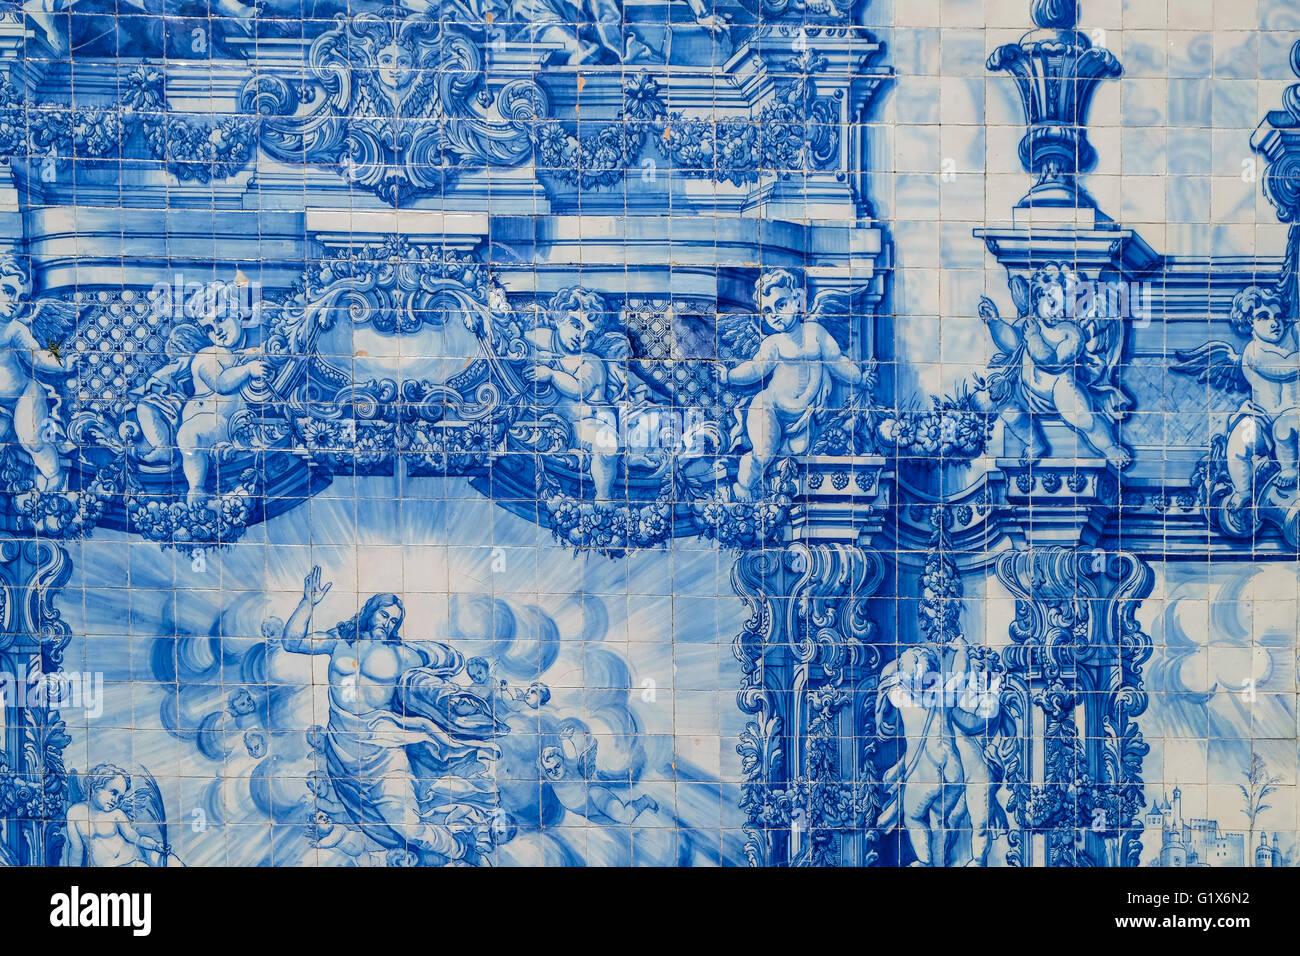 Capela das Almas, outer wall with azulejos tiles, detail, Porto, UNESCO World Heritage Site, Portugal - Stock Image